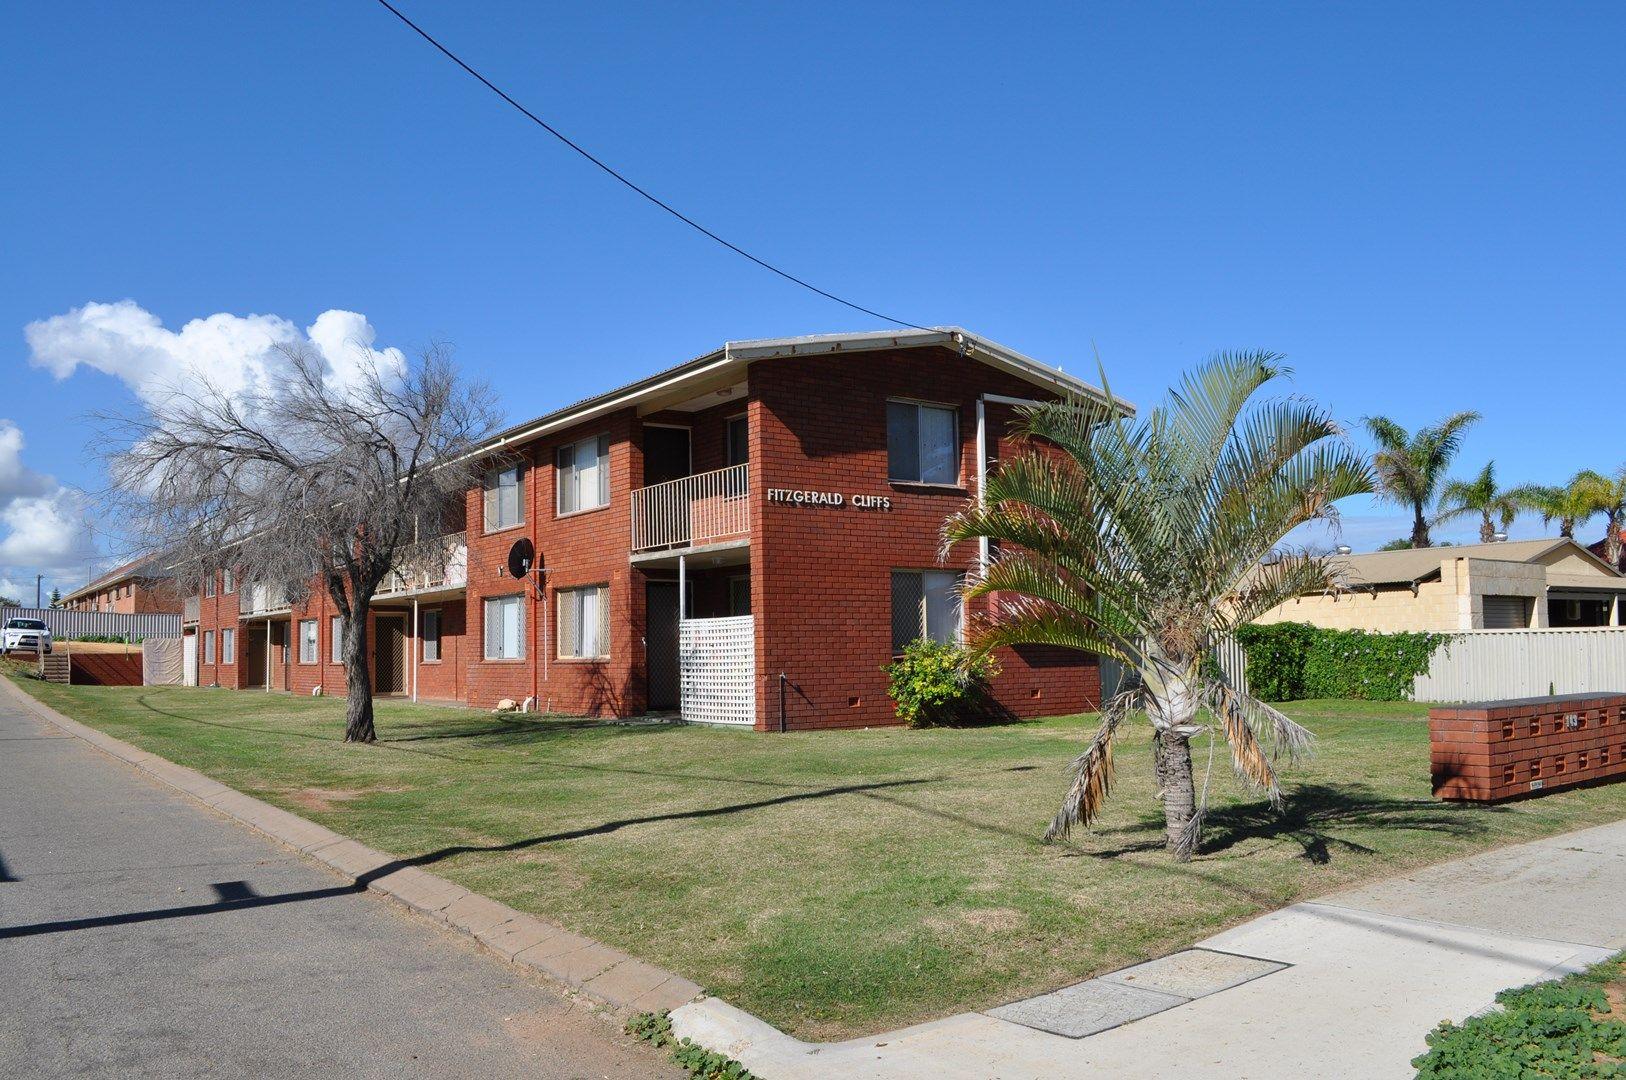 5/143 Fitzgerald Street, Geraldton WA 6530, Image 0